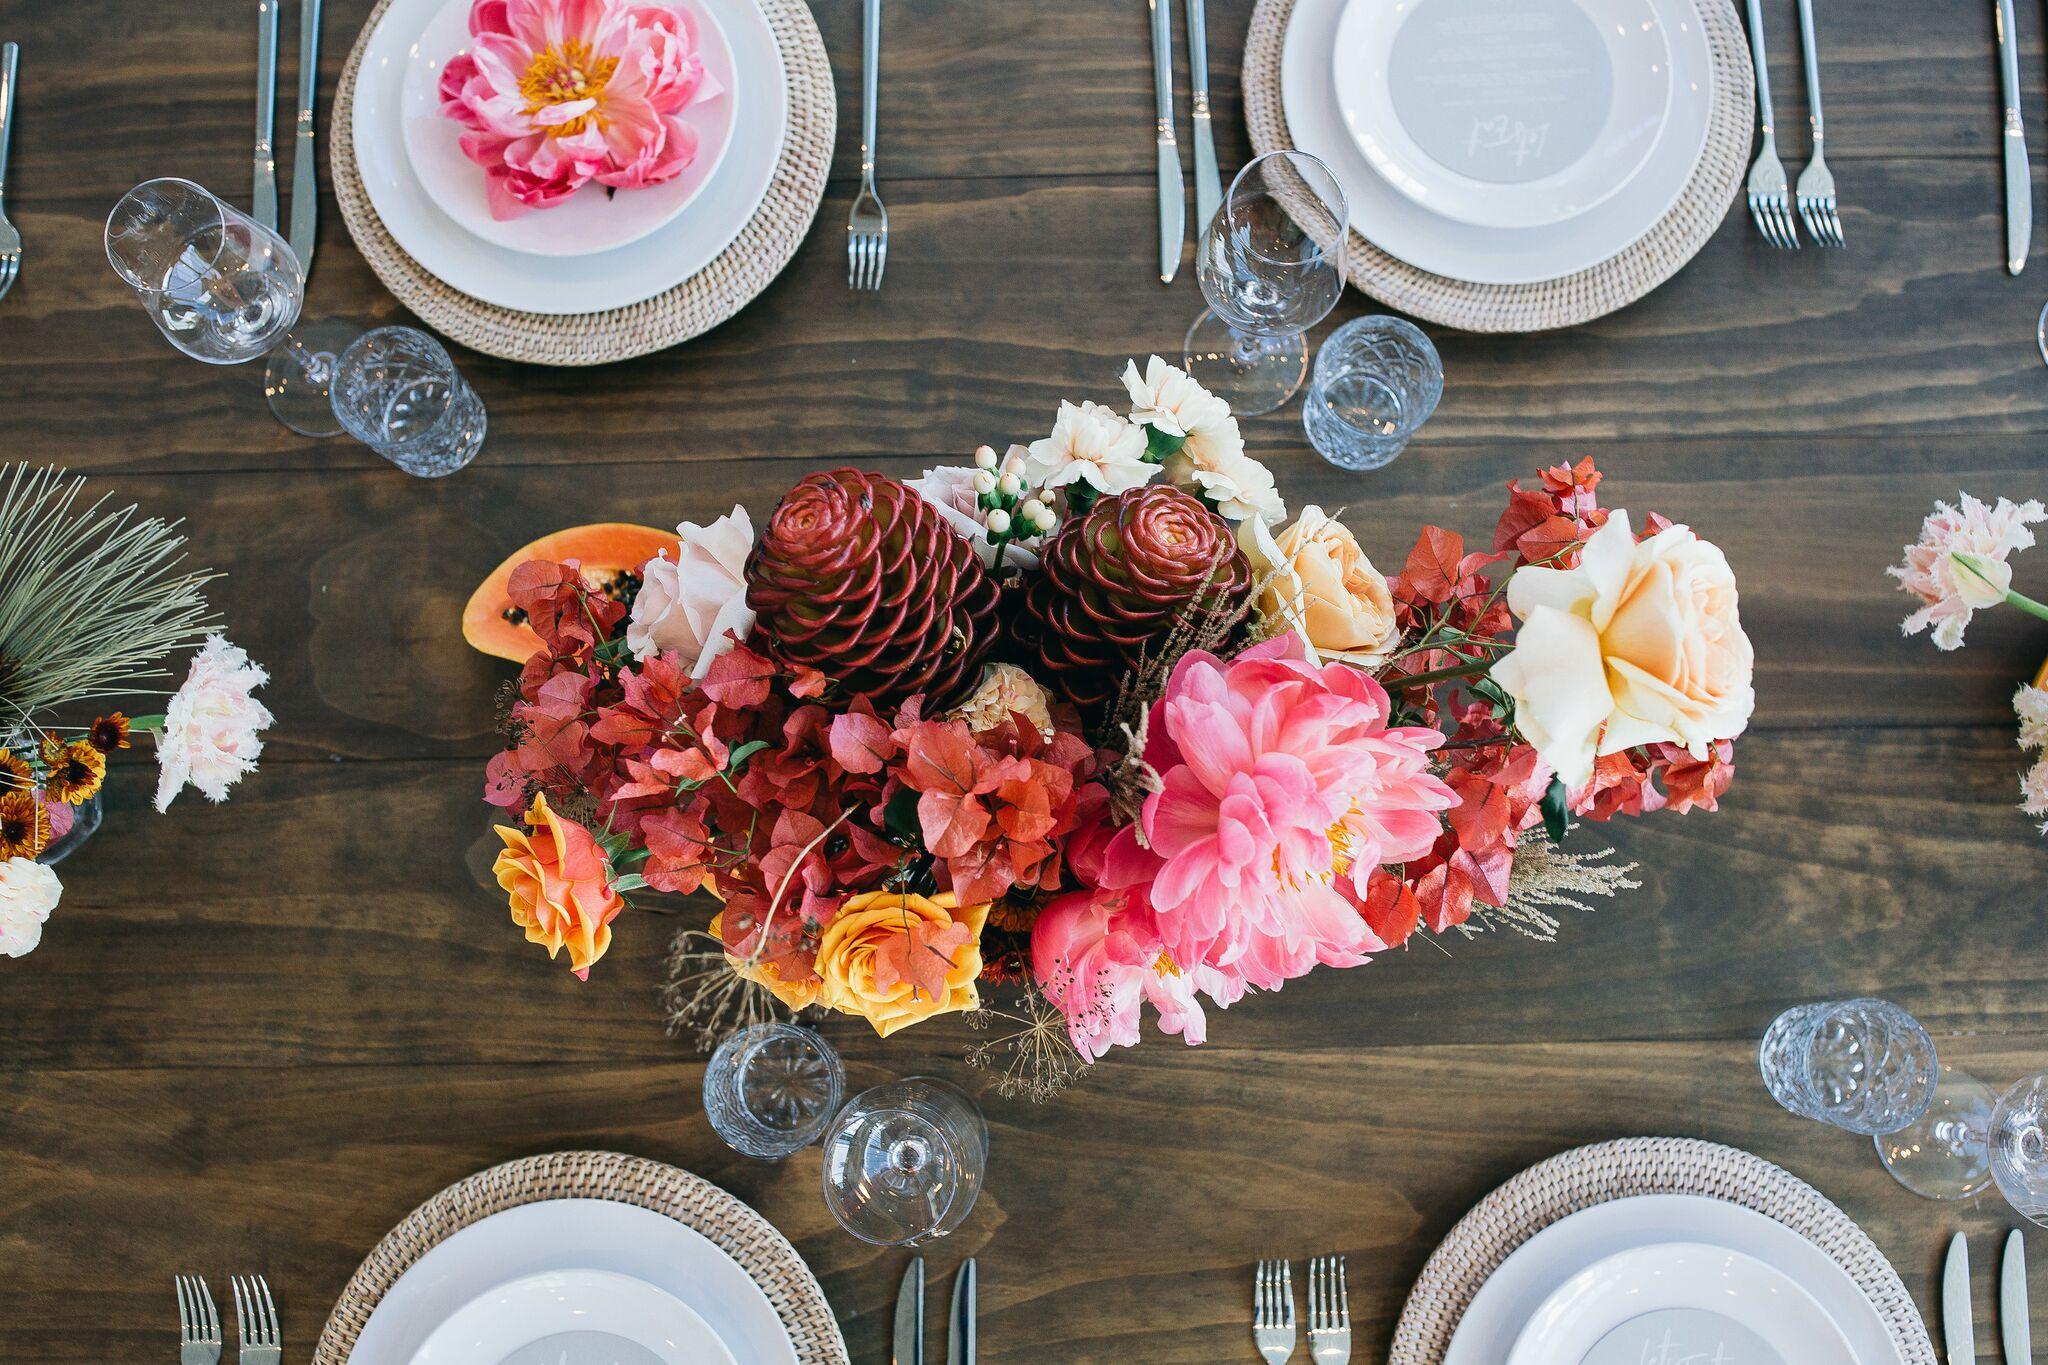 Wedding Tableware Hire Checklist - Image via  Figtree Wedding Photography